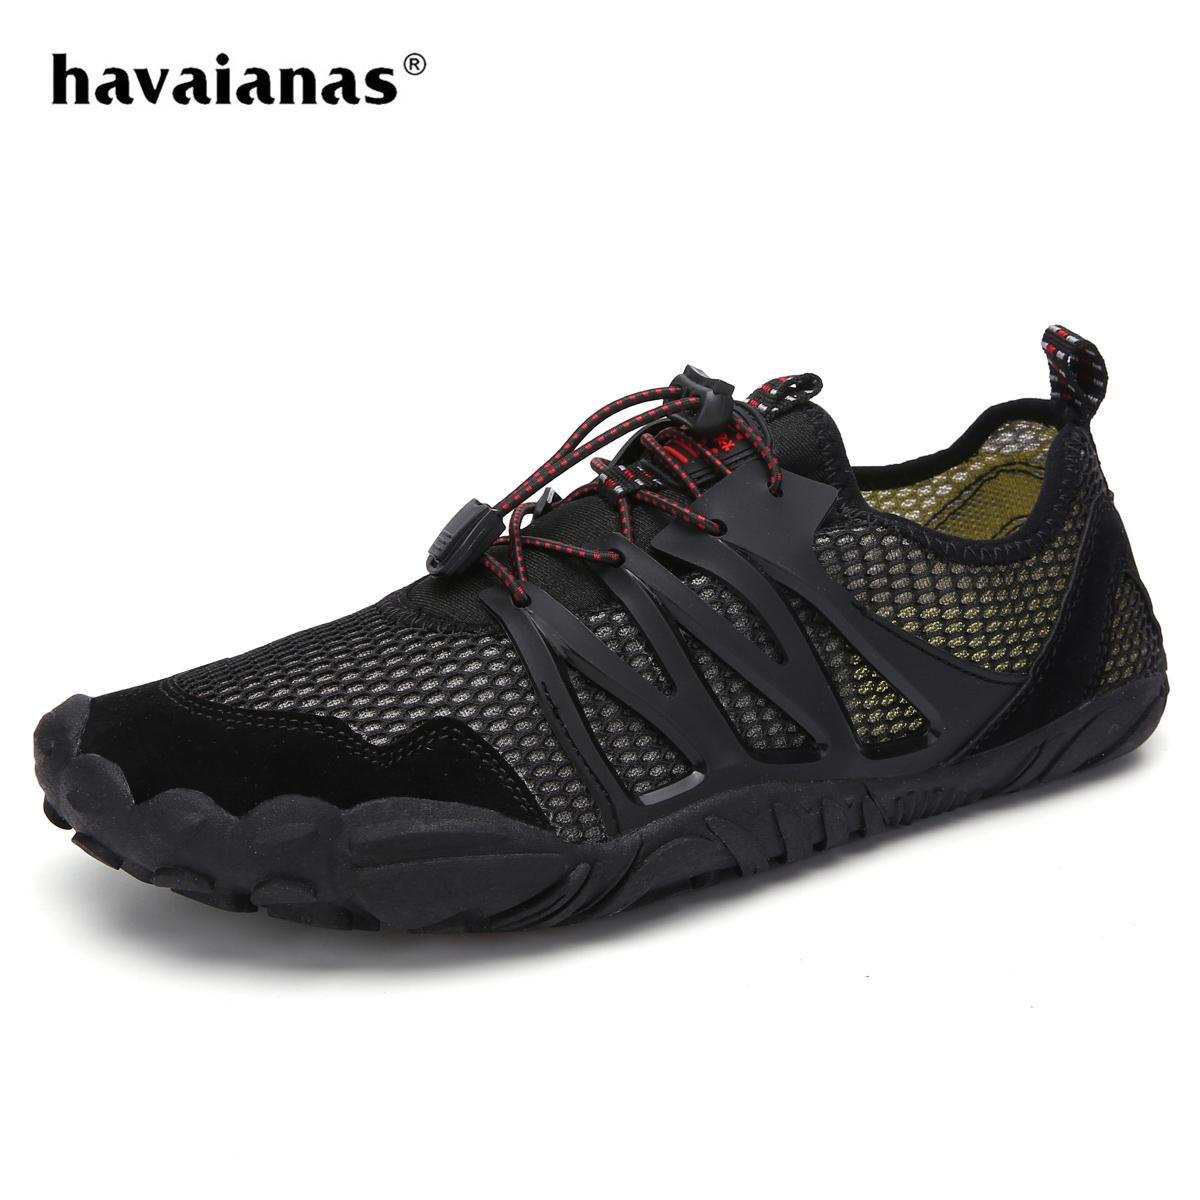 dd9d04a698b25f Havaianas_Water Shoes Shoes Men Shoes For Men Aqua Shoes Outdoor Shoes  Beach Shoes Lightweight Quick-